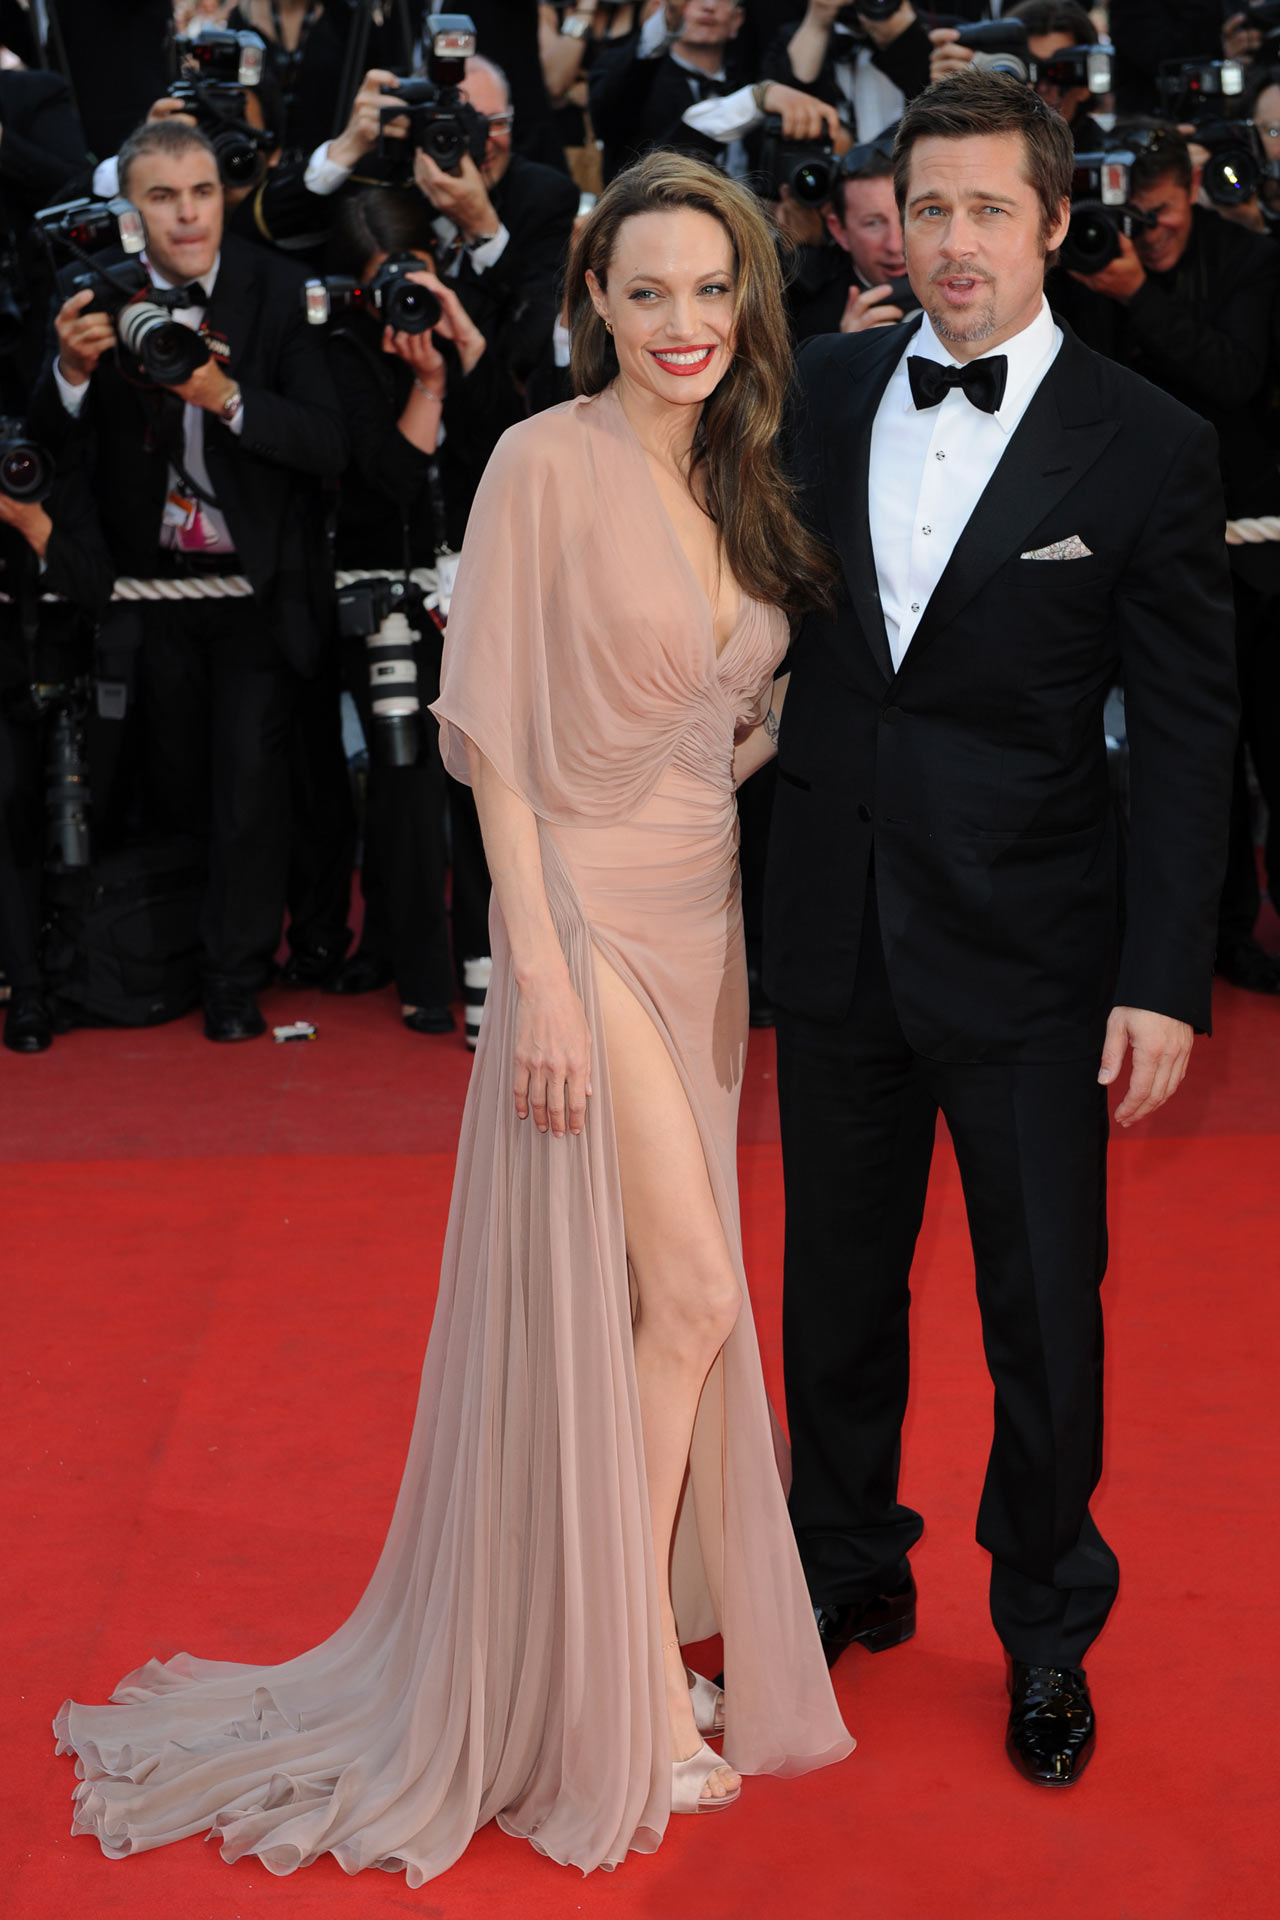 Angelina Jolie: Οι λεπτομέρειες του νυφικού, το μενταγιόν και το γαμήλιο δείπνο!